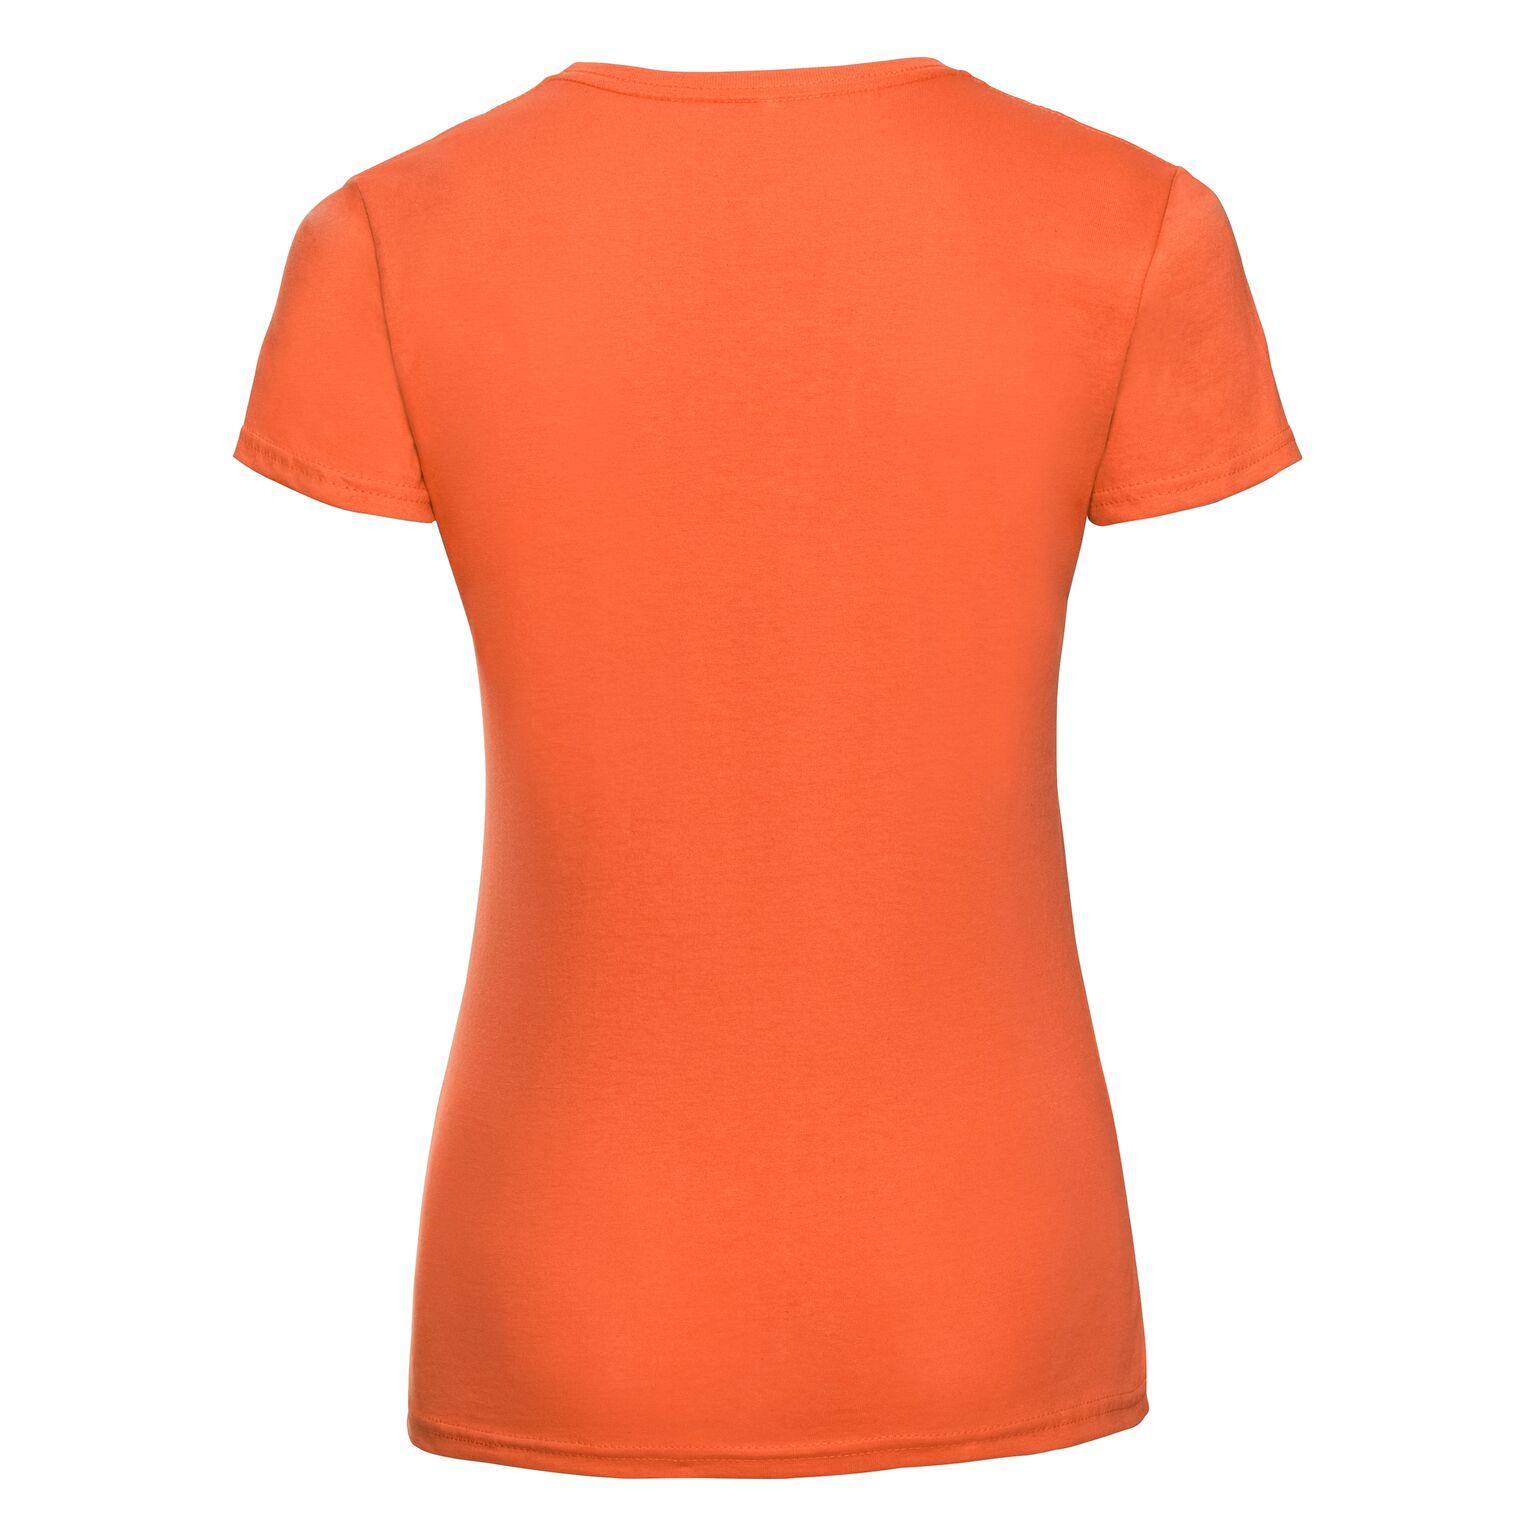 05_j155f_orange--0-0--a4d168e0-c789-4a8e-8557-ac932c3e1a25